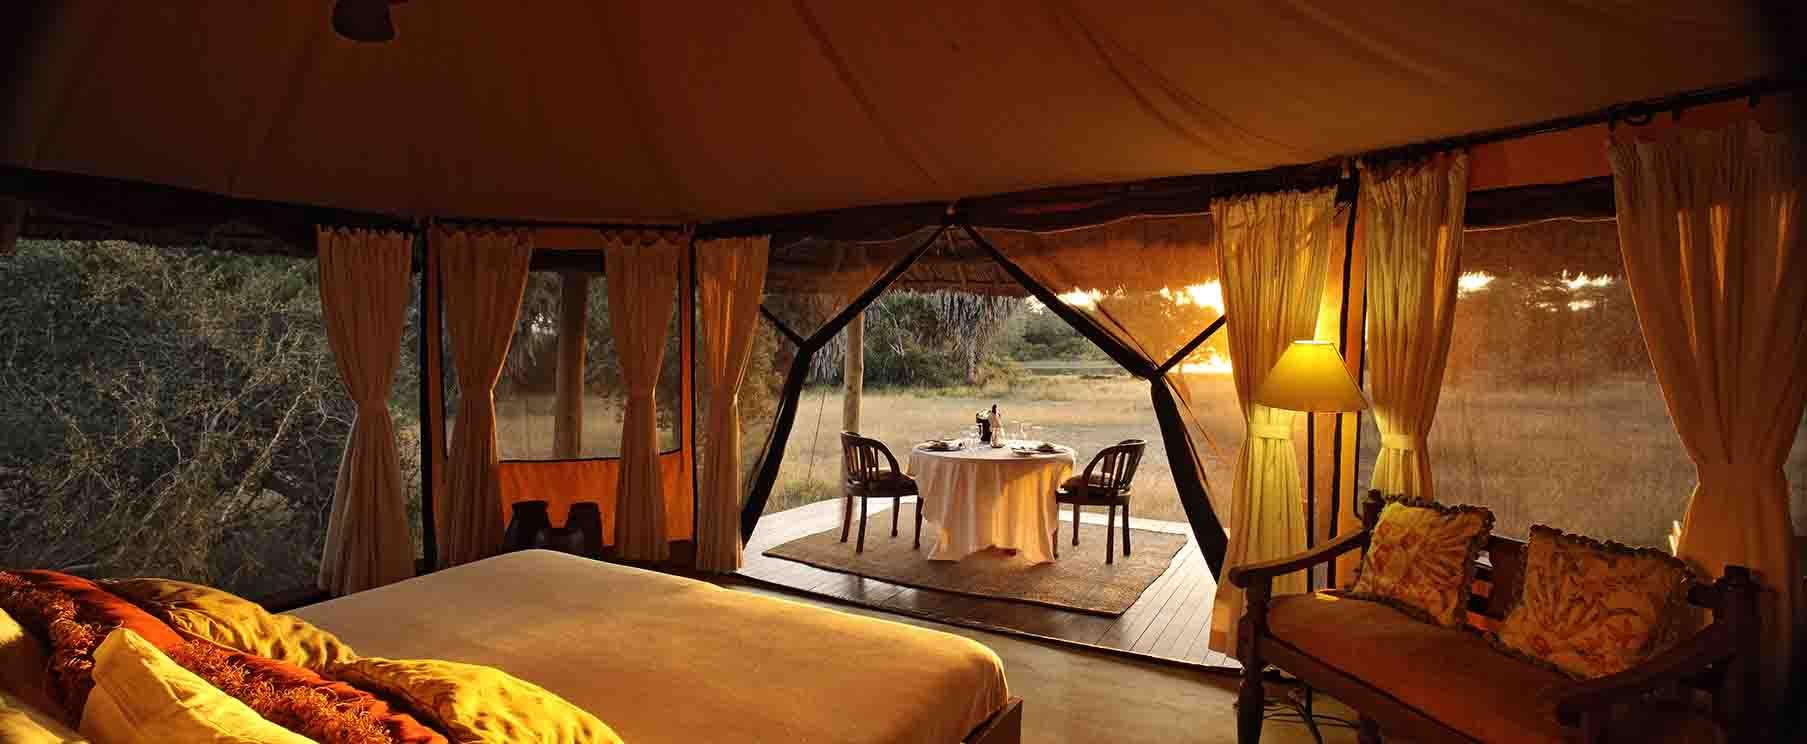 Glamping in Siwandu Tents